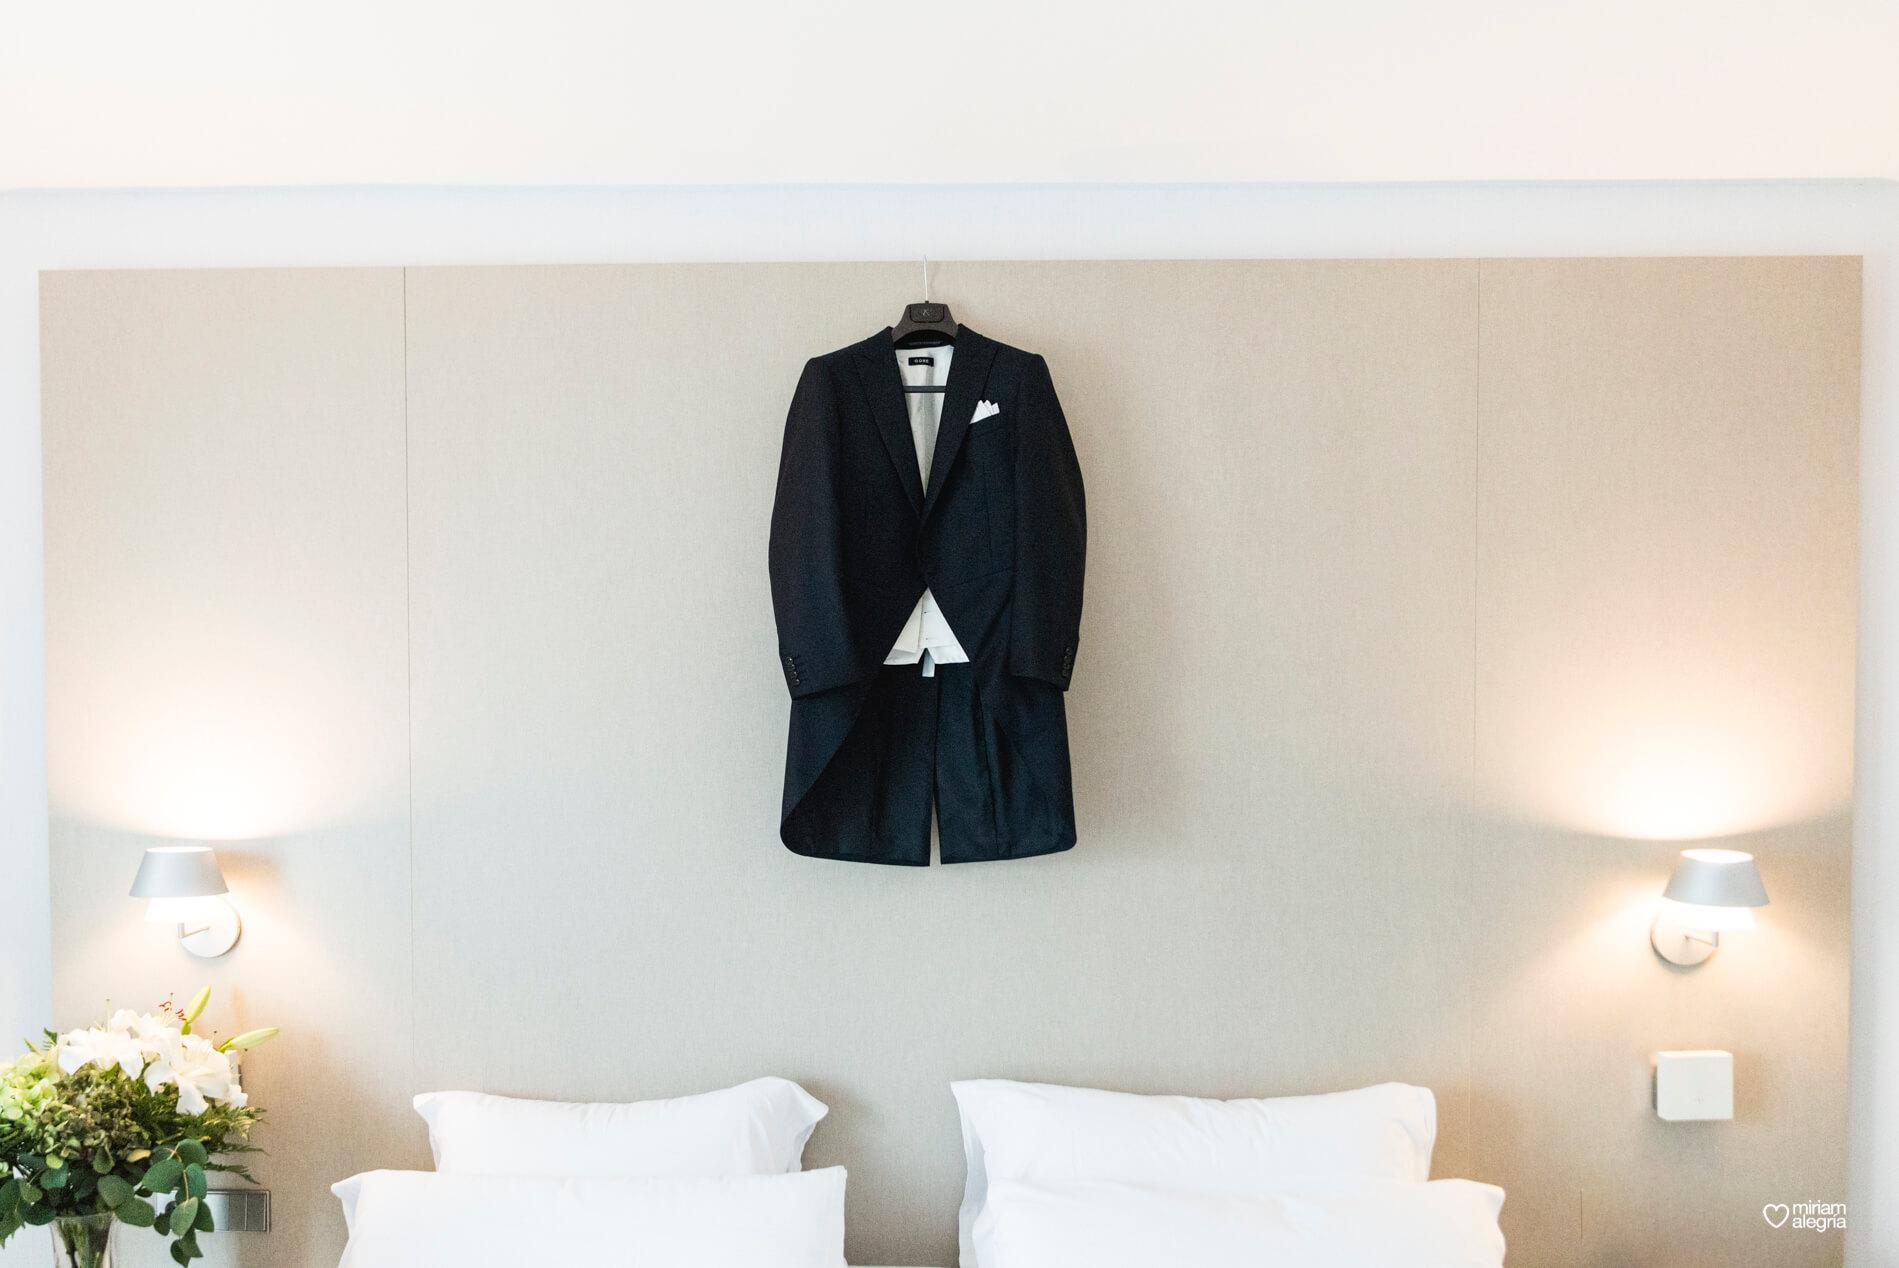 vestido-de-novia-paula-del-vas-miriam-alegria-fotografos-boda-murcia-160